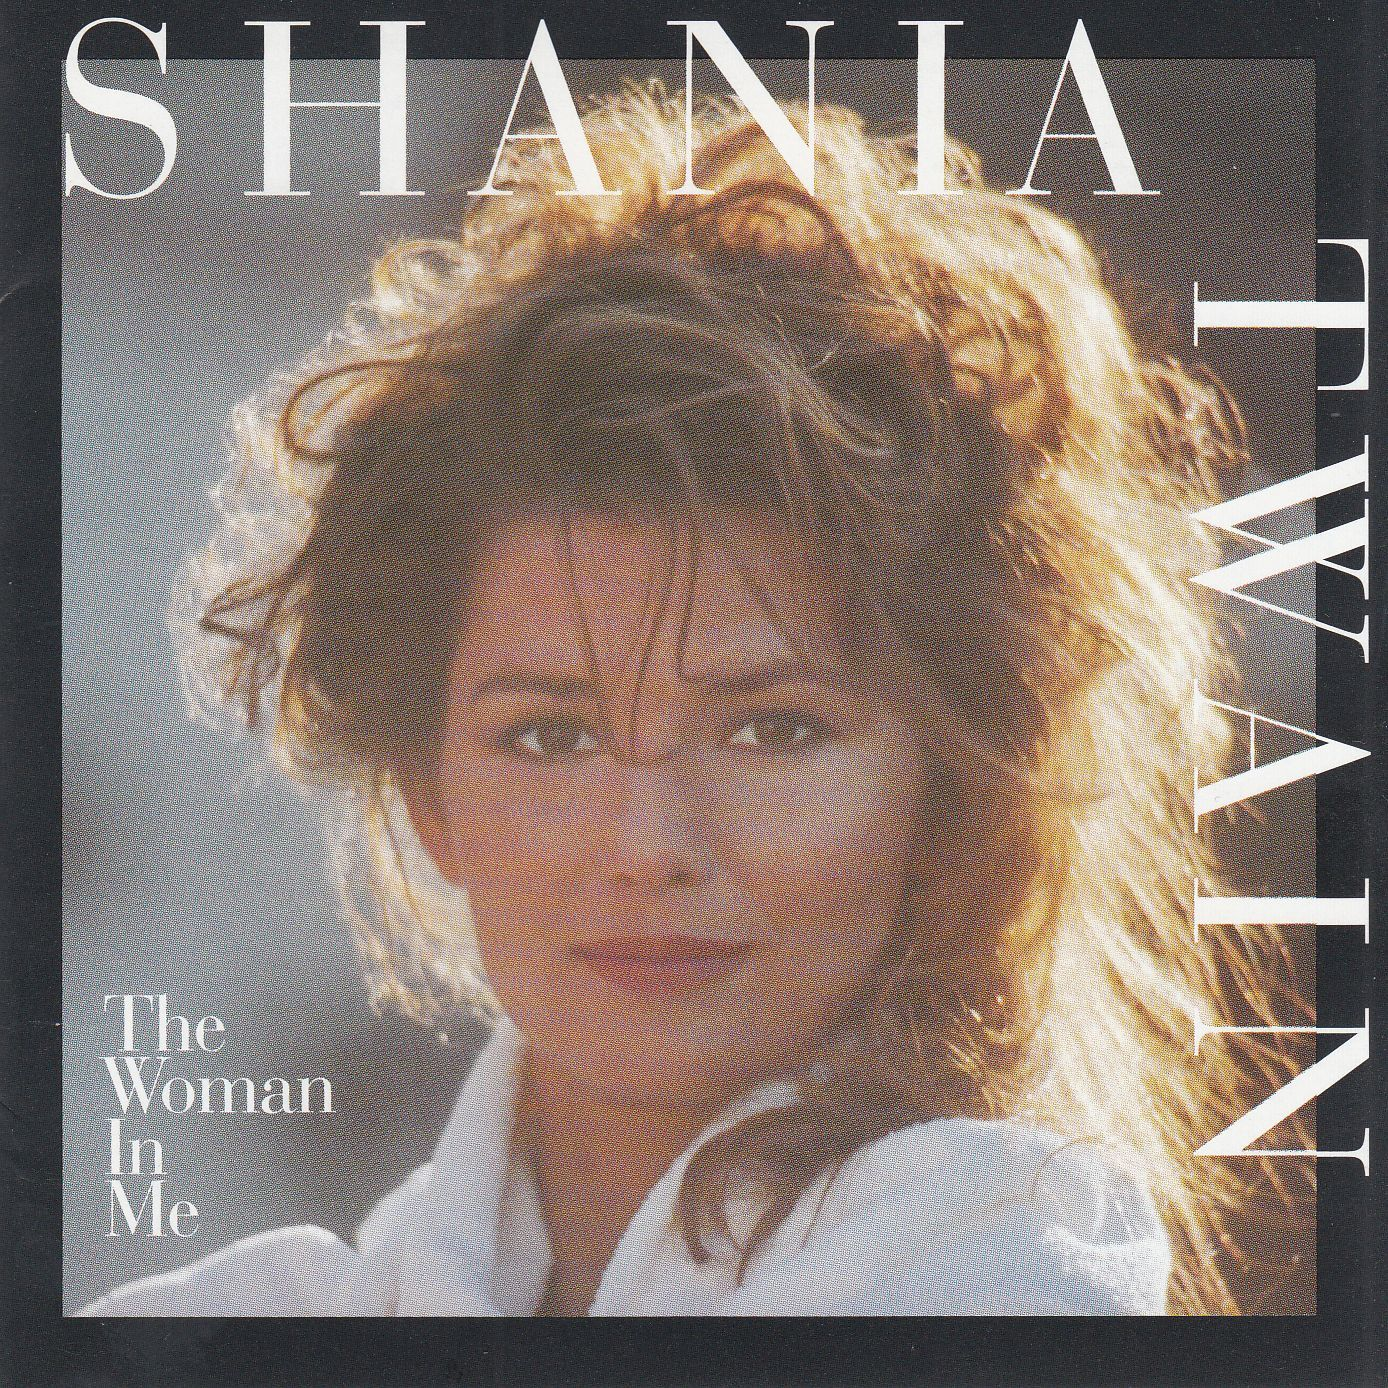 Shania Twain - The Woman In Me - Album Cover